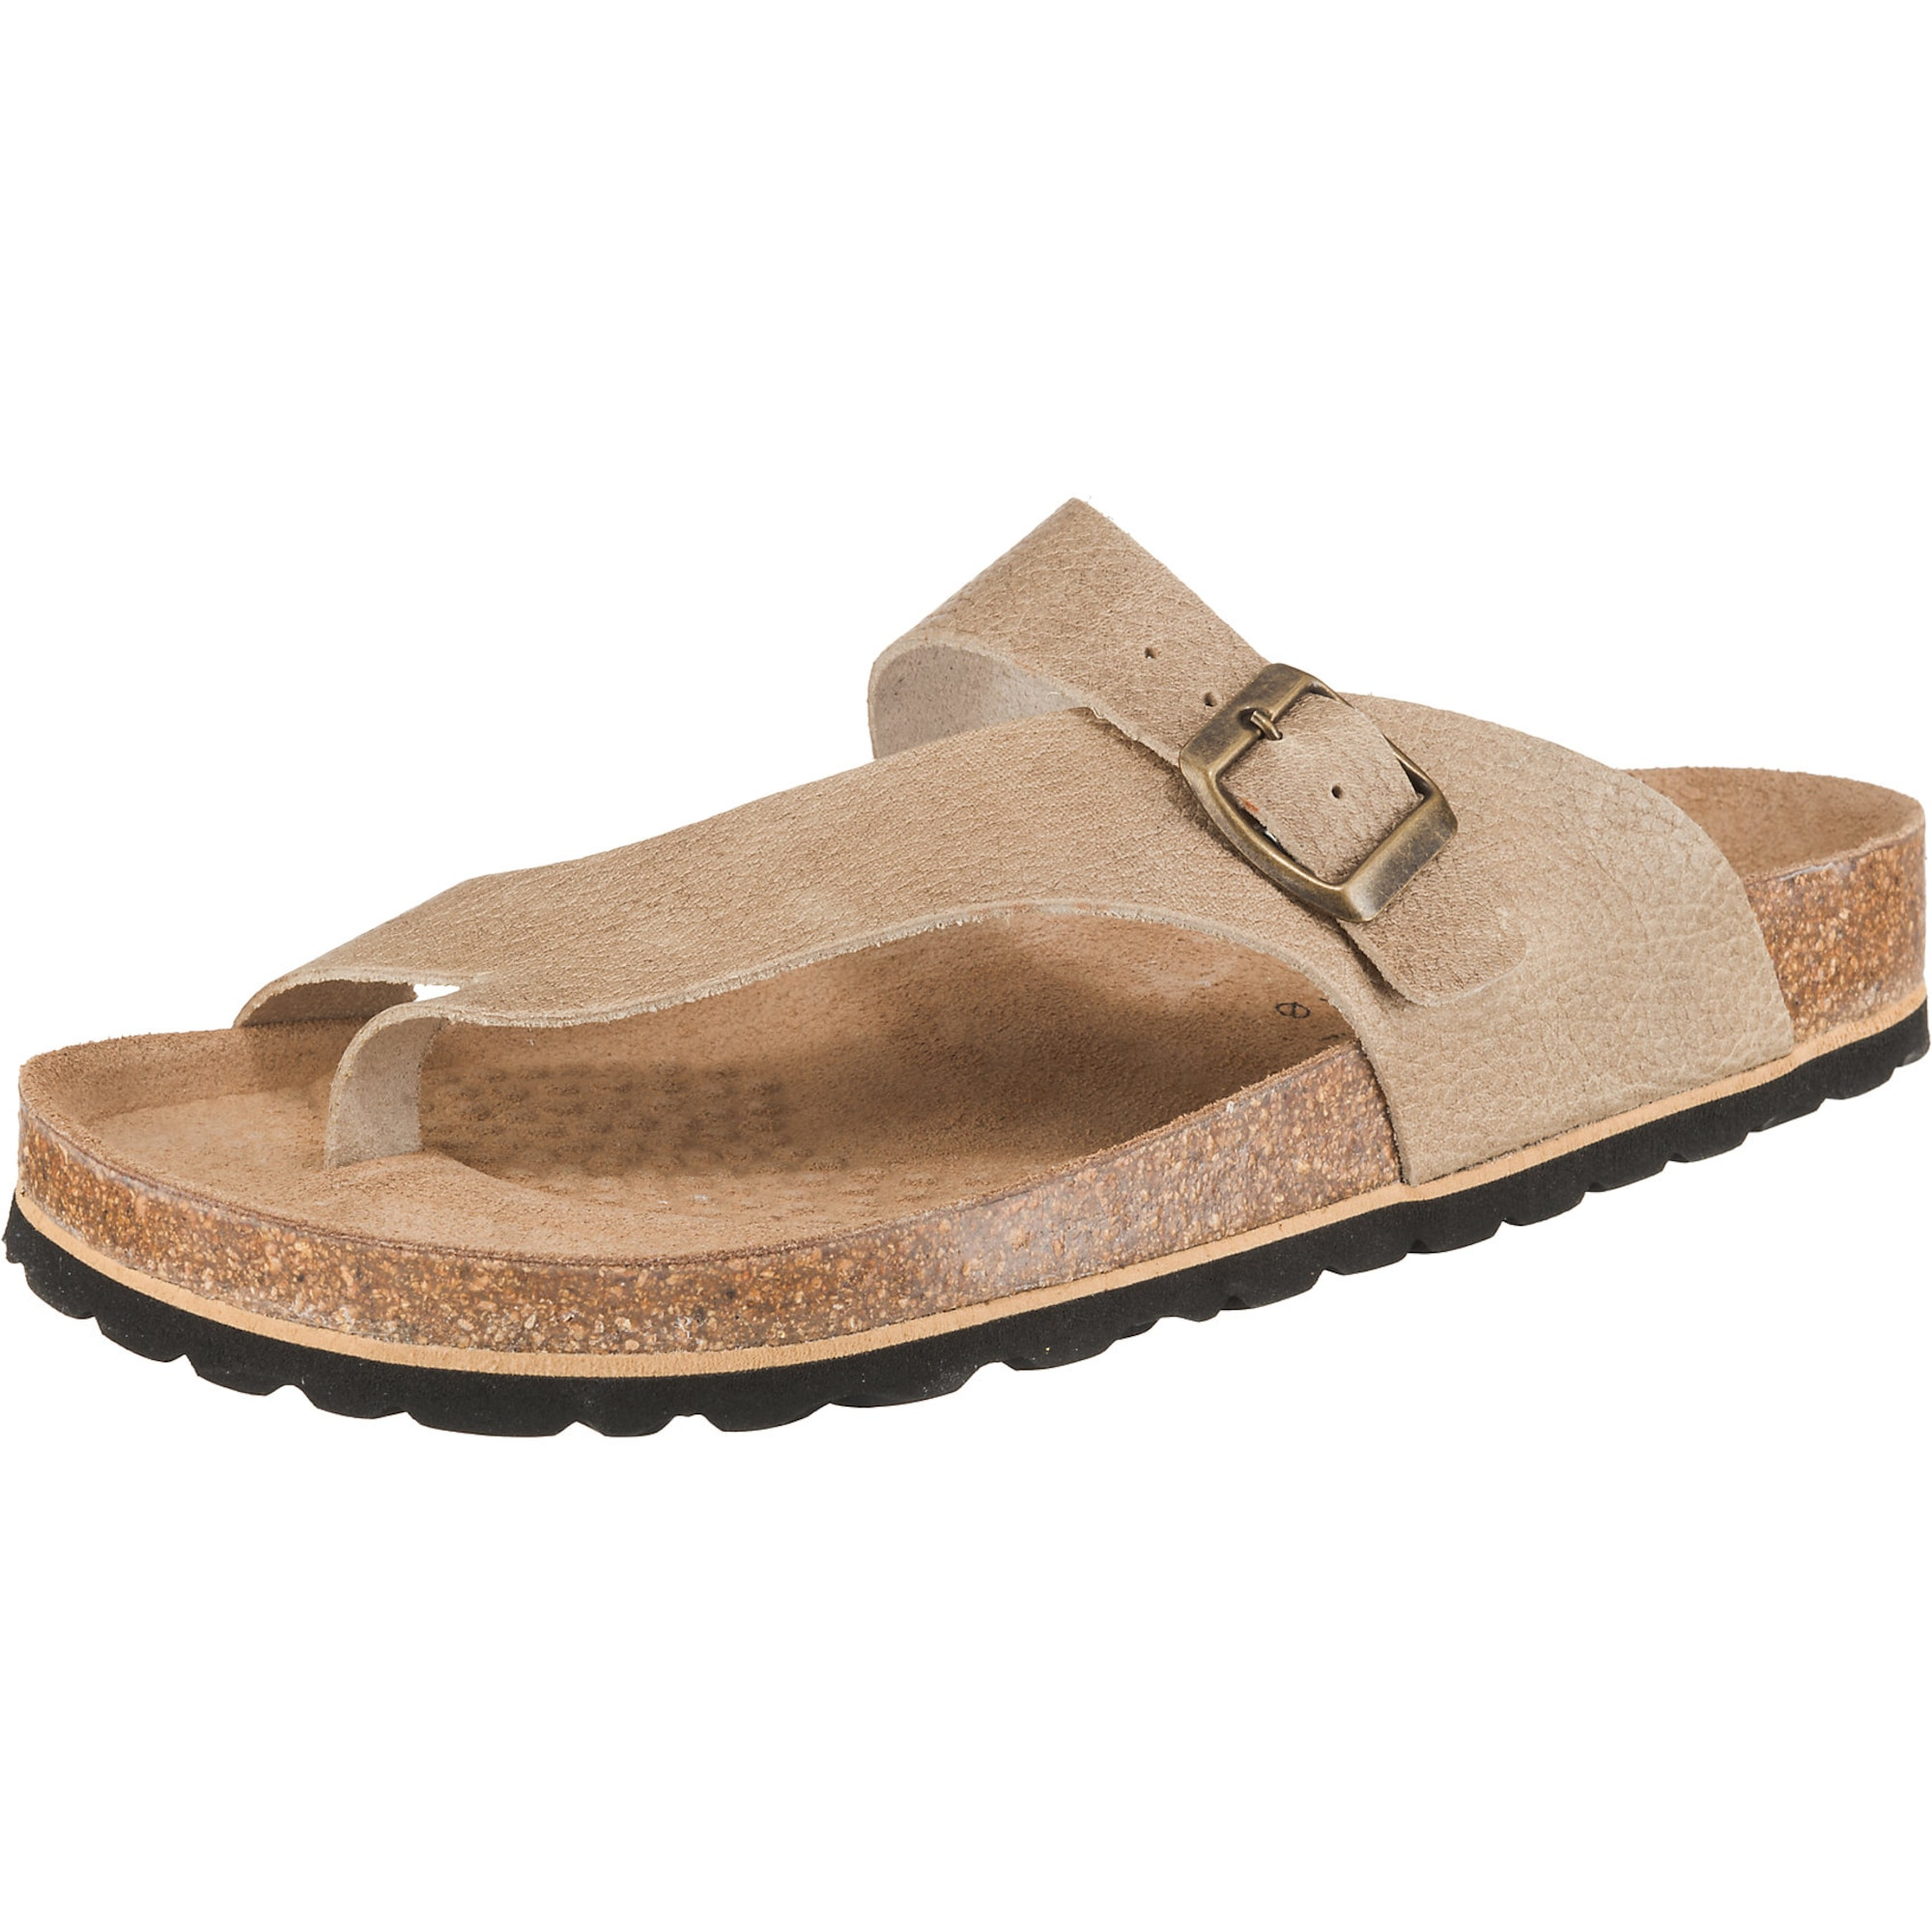 Zehentrenner   Schuhe > Sandalen & Zehentrenner > Zehentrenner   Paul Vesterbro